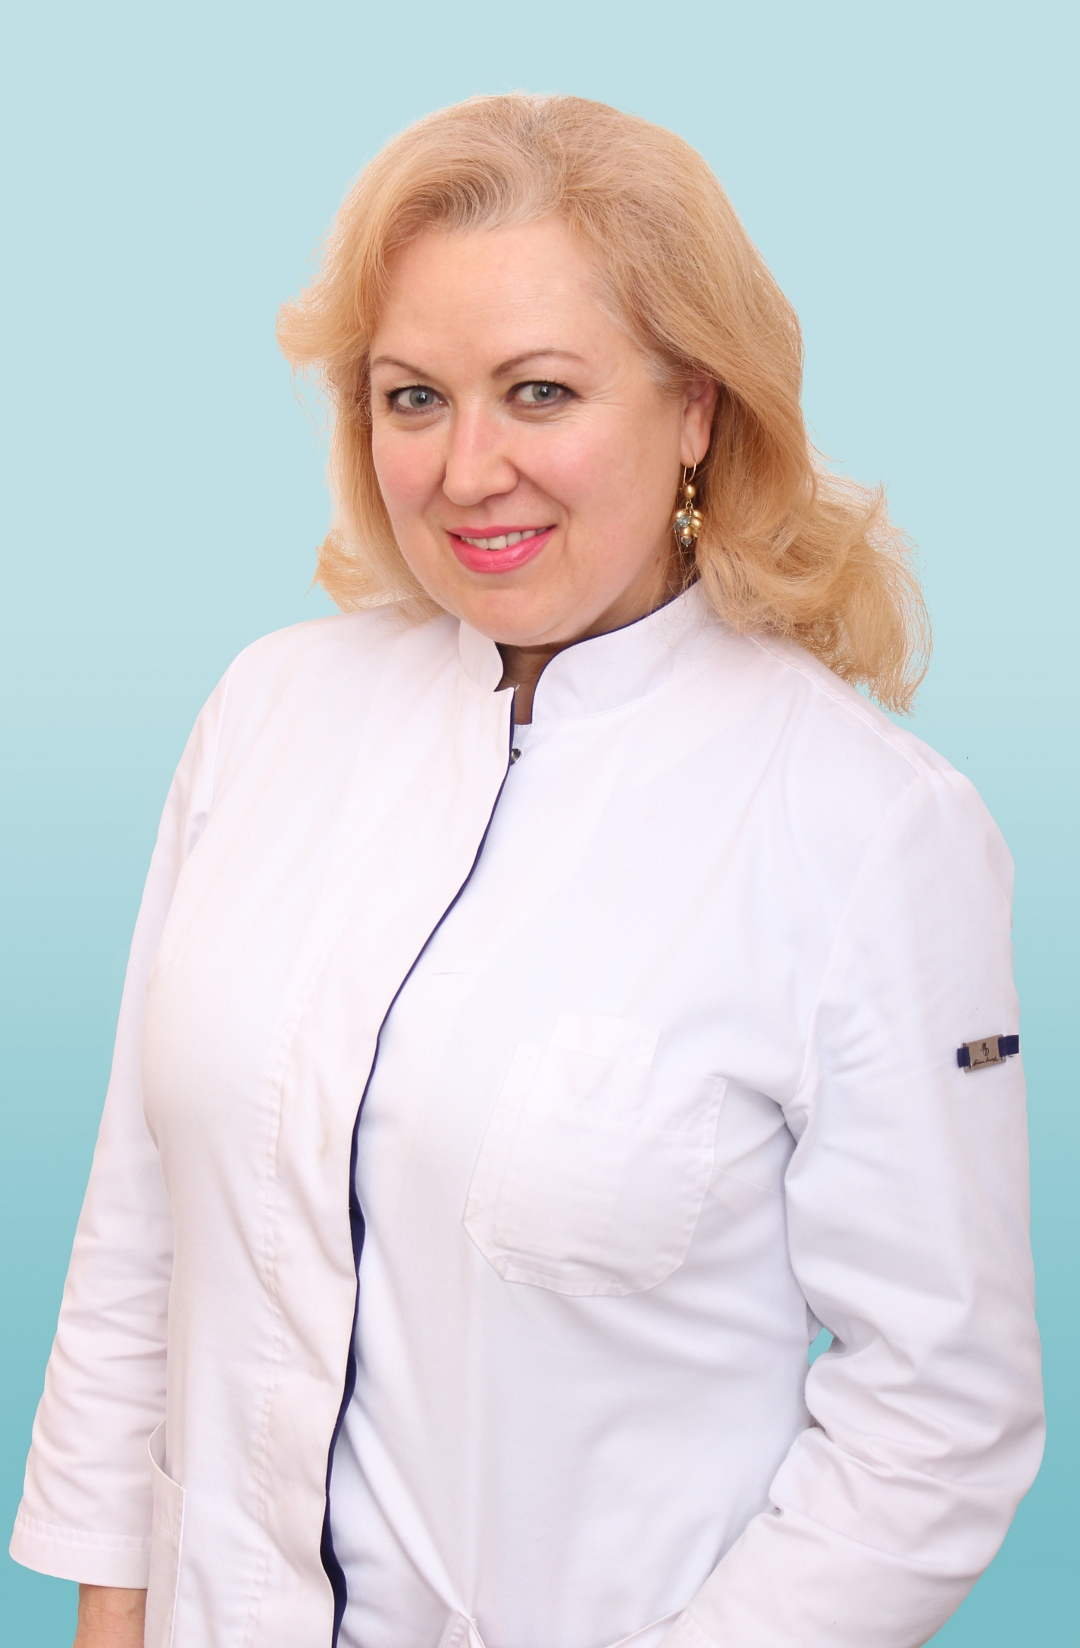 Врач акушер-гинеколог Лемешева Татьяна Алексеевна